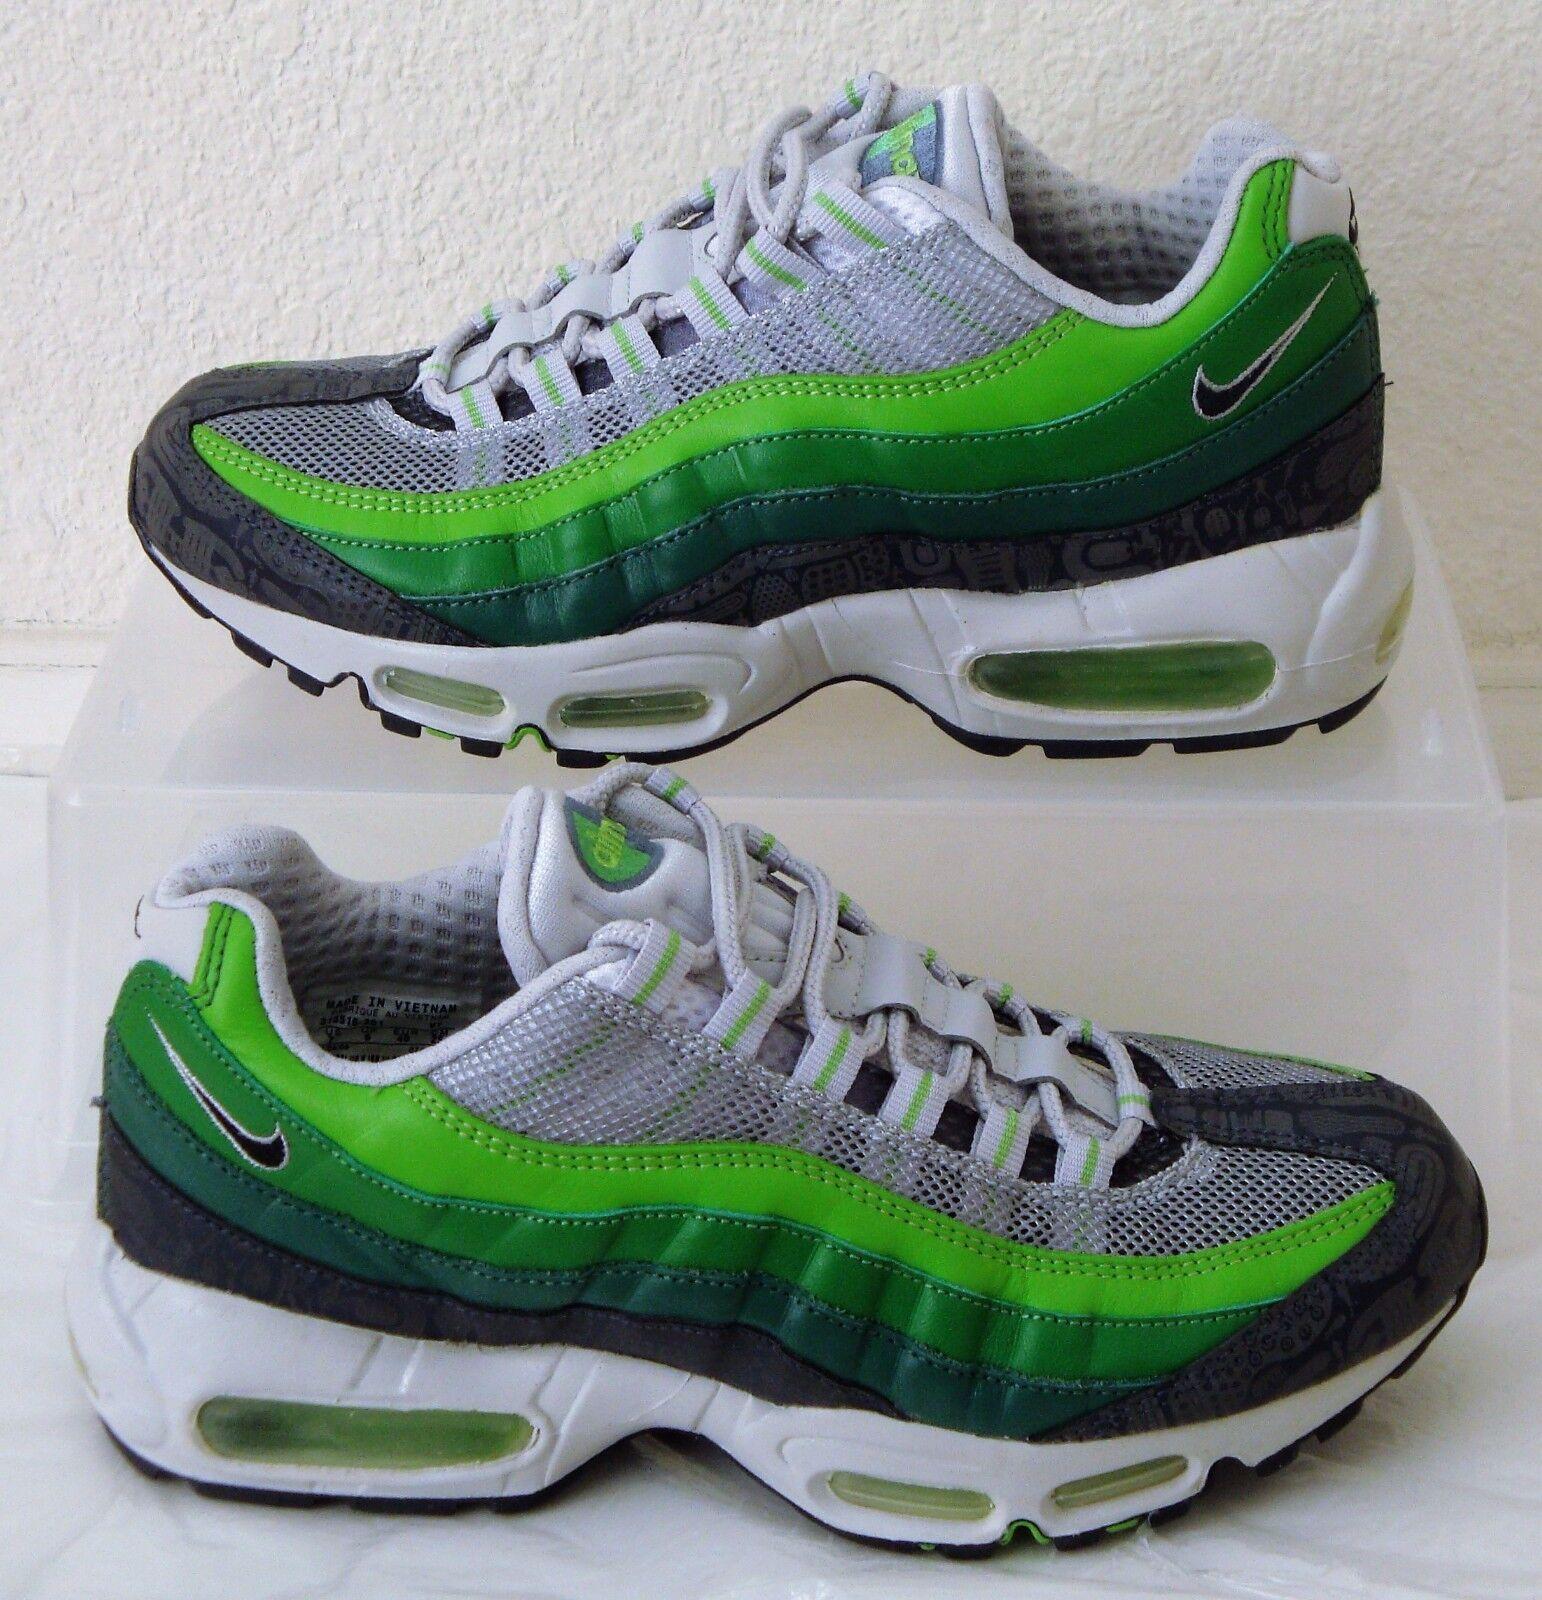 Vintage New Nike Air Max 95 Premium Rejuvenation Mens US Size 7.5 UK 6.5  Green